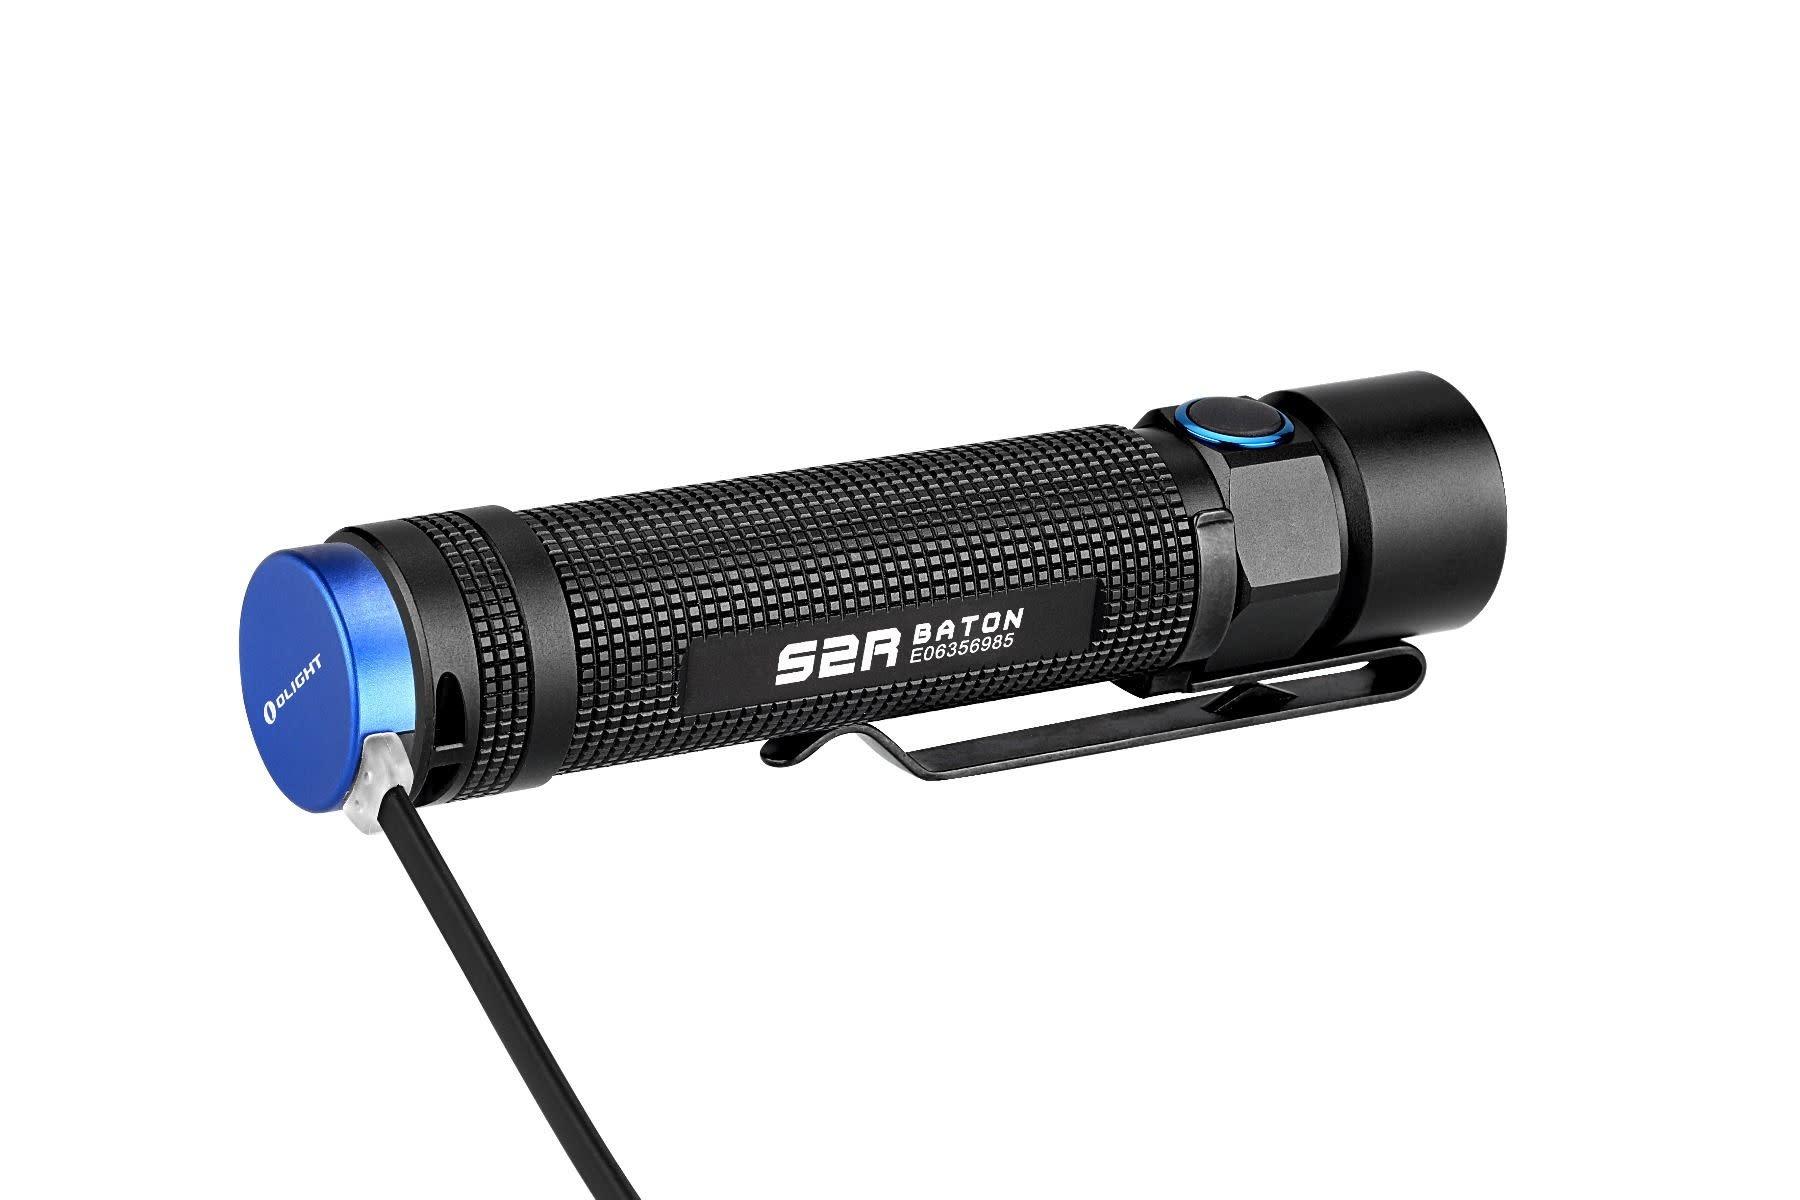 Olight Olight S2R Baton Flashlight